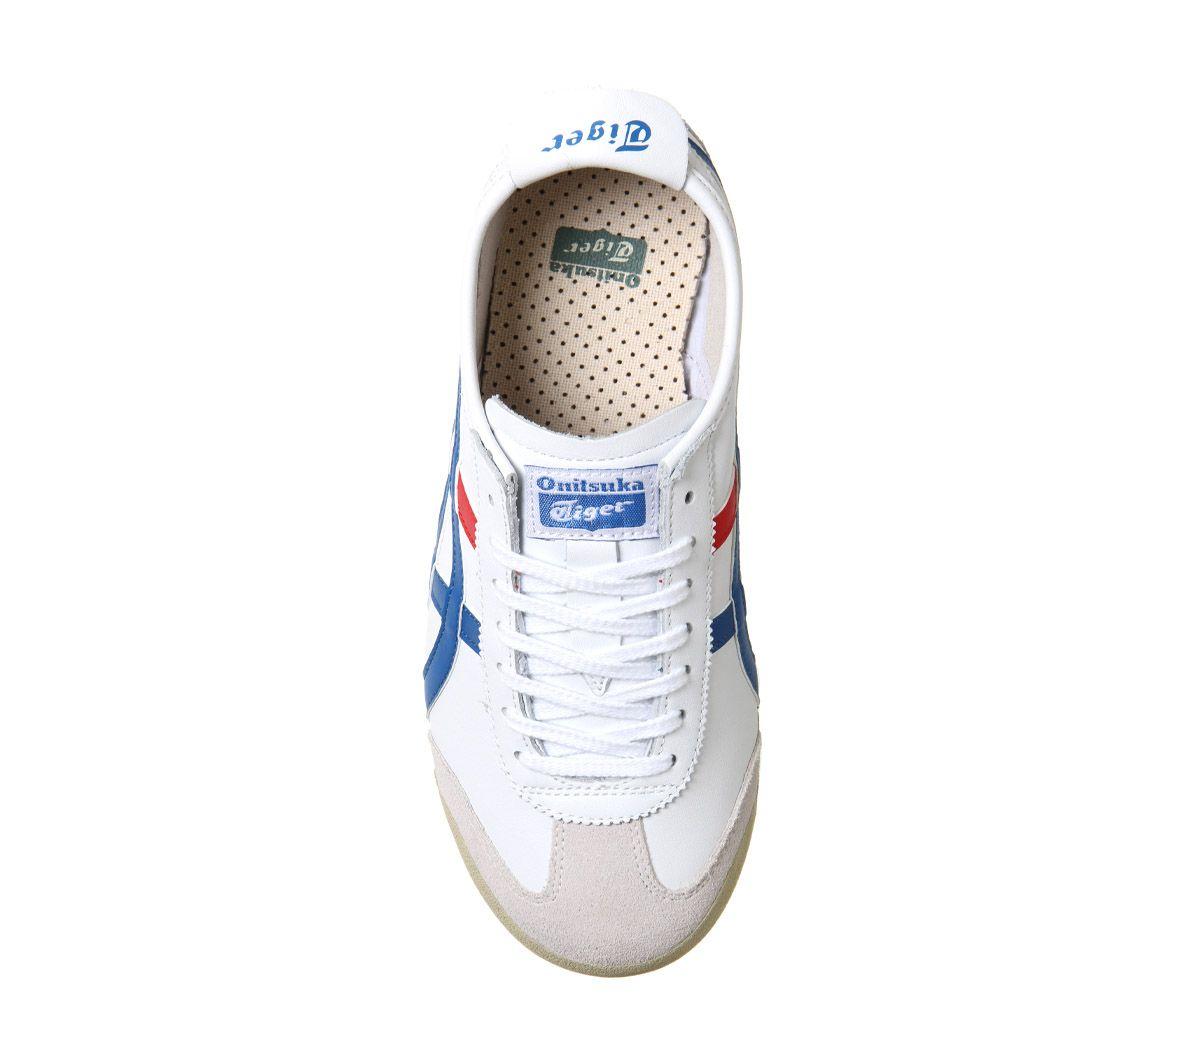 onitsuka tiger mexico 66 shoes online oficial qatar direccion